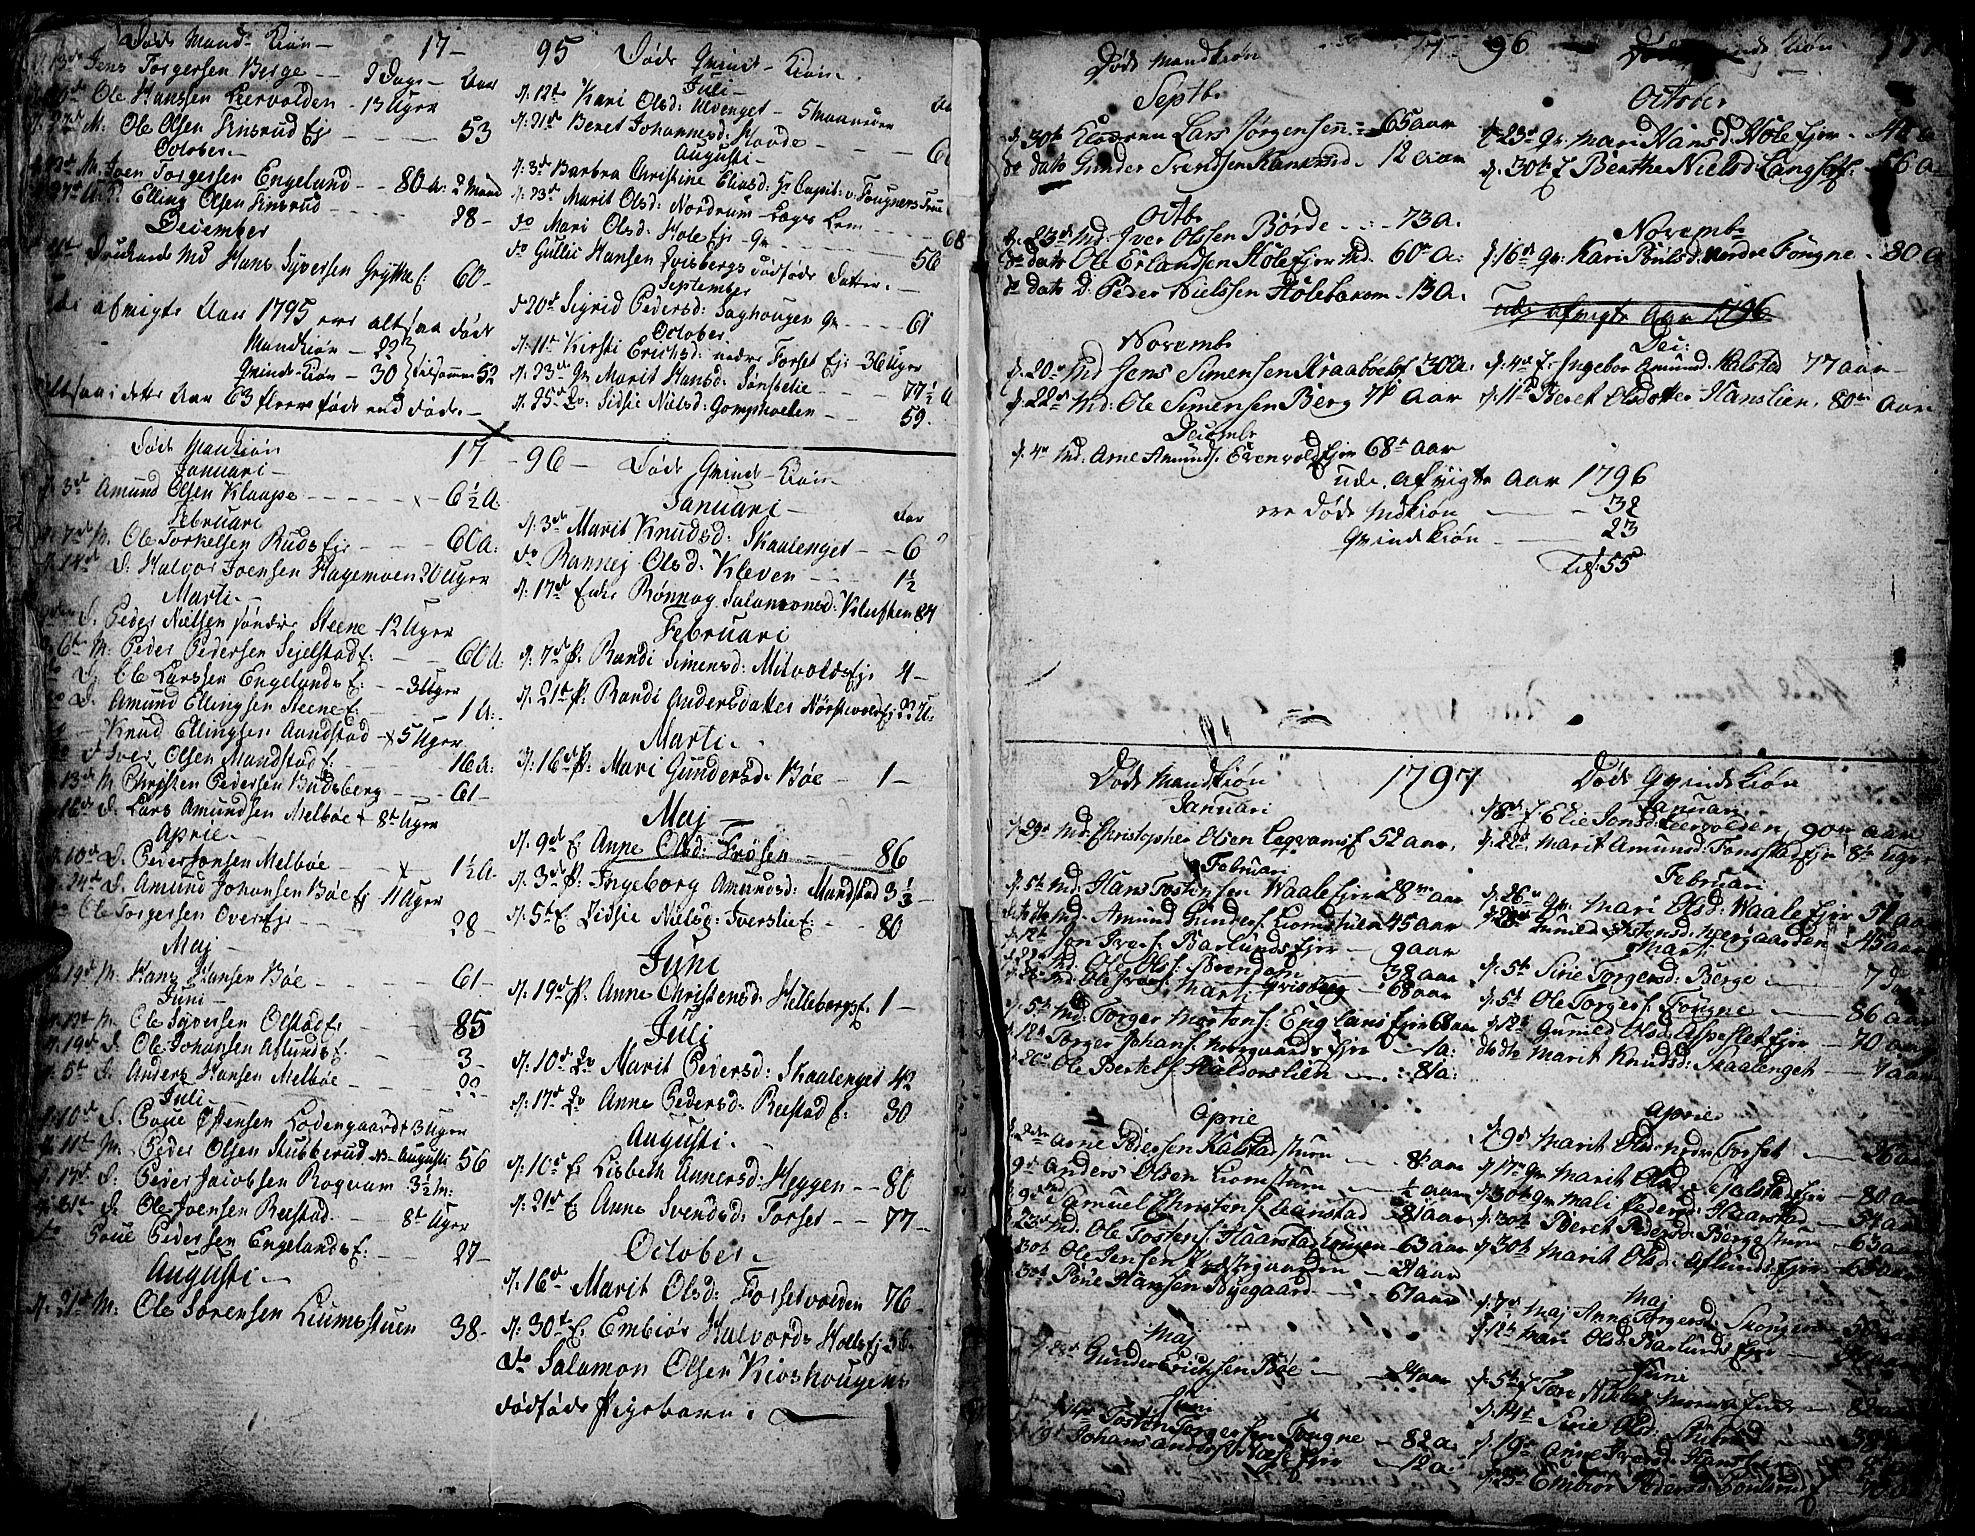 SAH, Gausdal prestekontor, Ministerialbok nr. 3, 1758-1809, s. 357